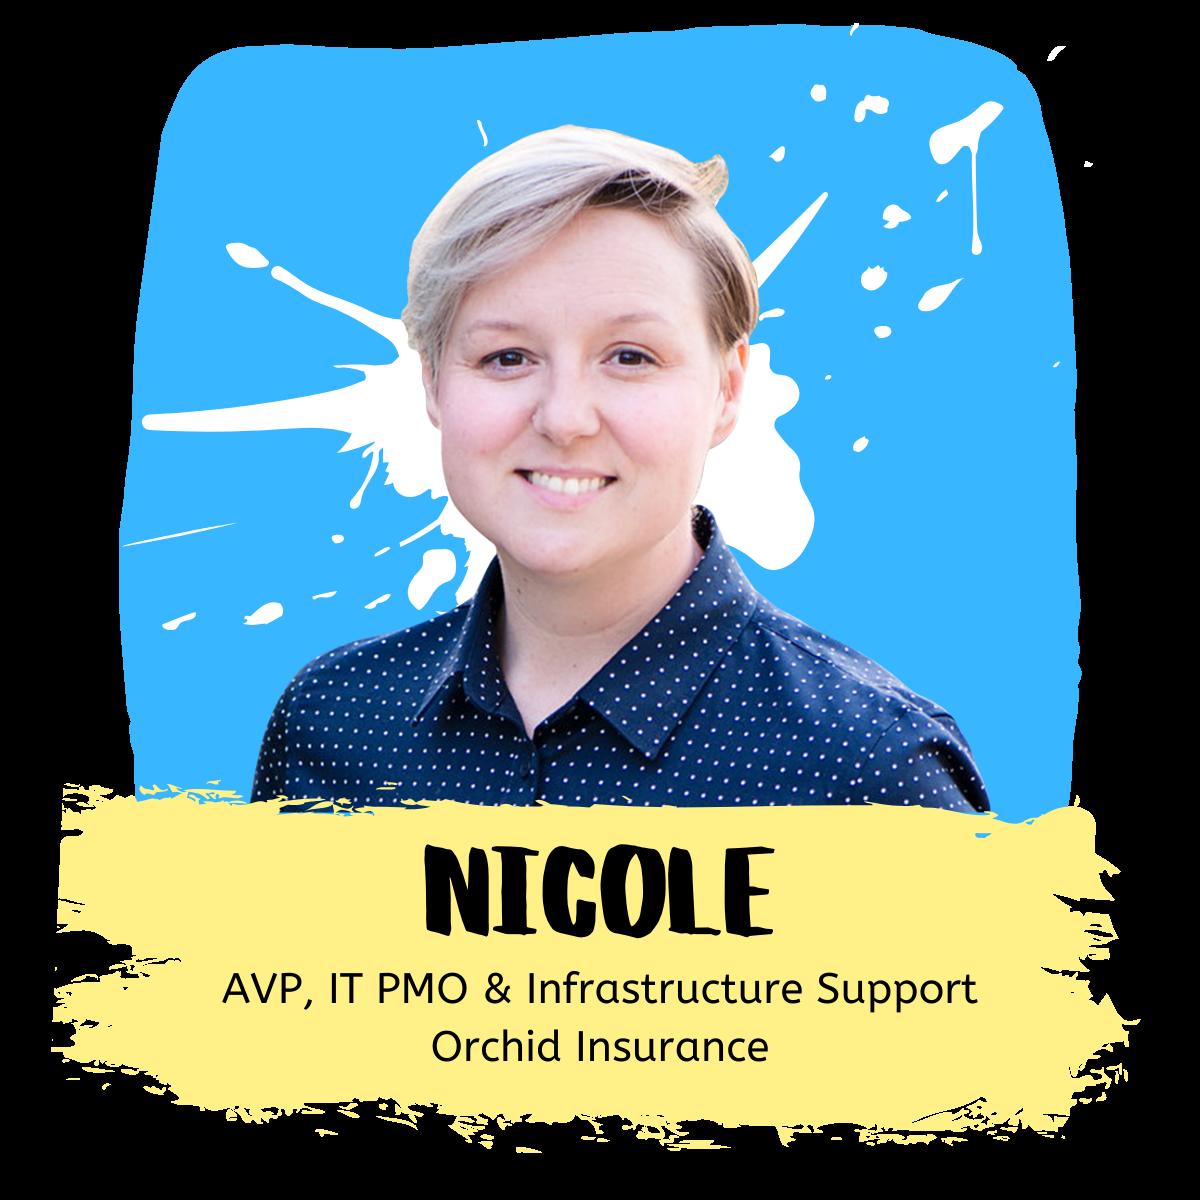 Nicole-orchid-customer-love-tile